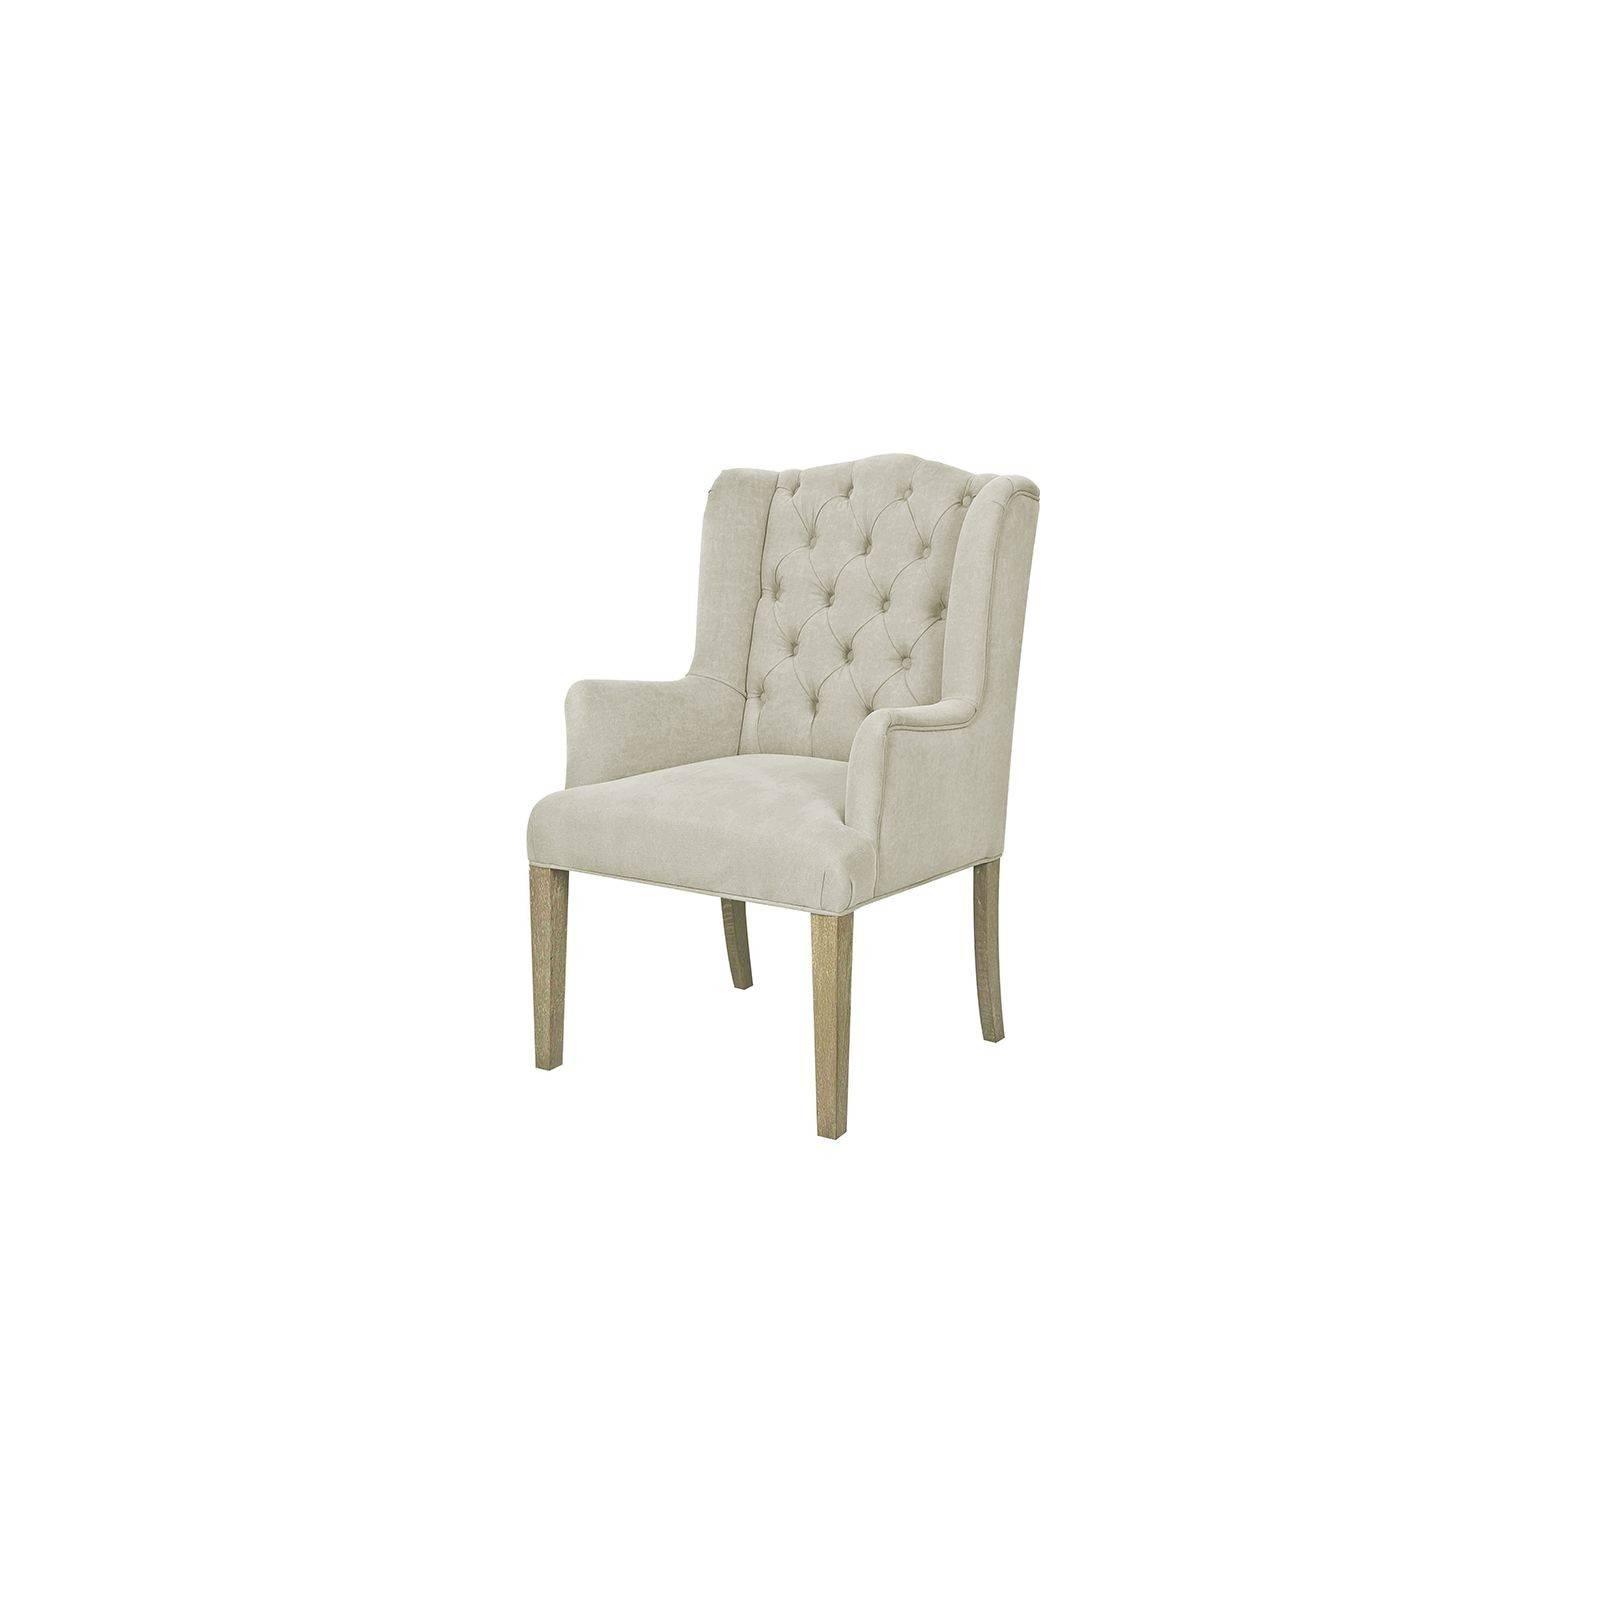 chaise capitonnee avec accoudoir